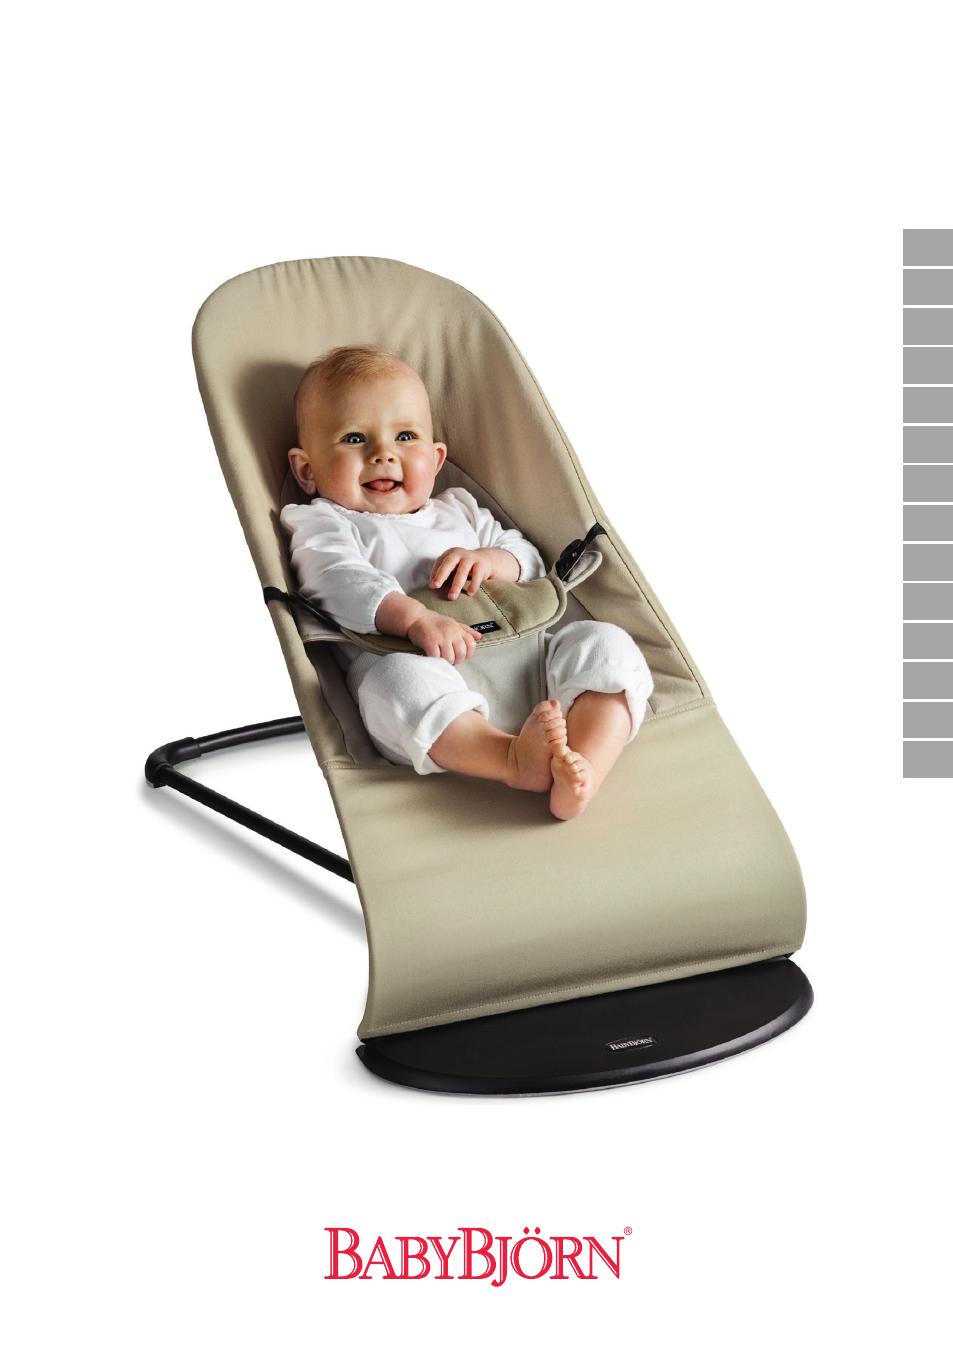 babybj rn bouncer balance soft user manual 60 pages rh manualsdir com babybjorn instruction manual babybjorn baby carrier manual